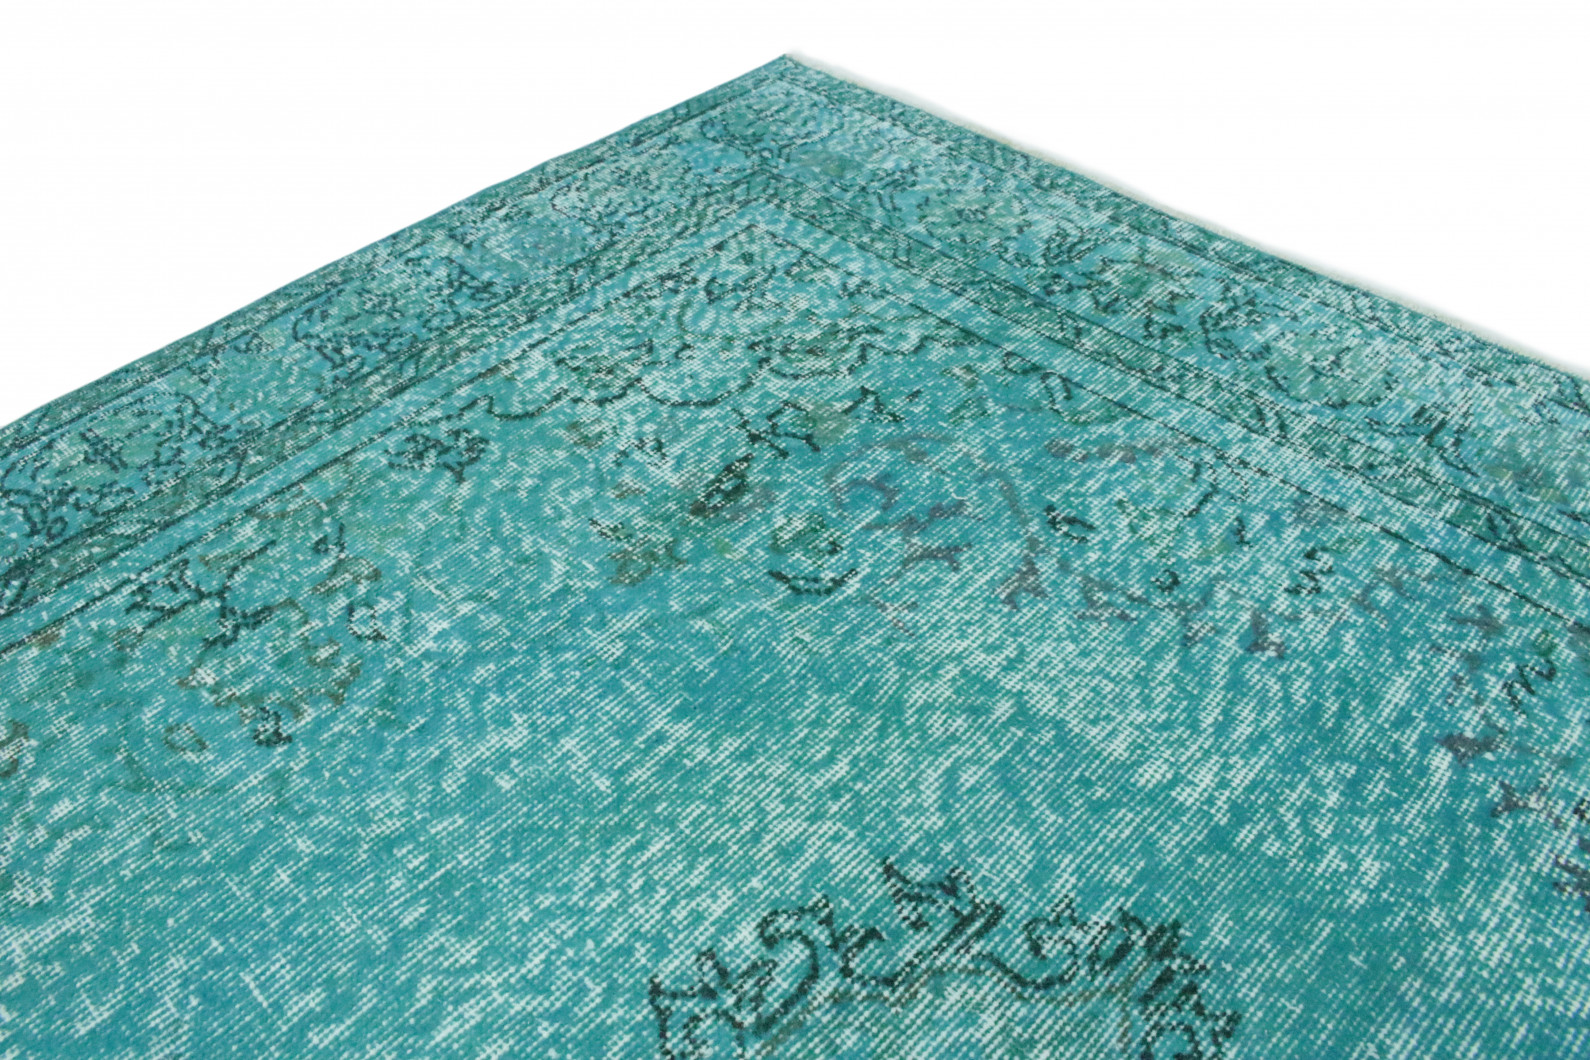 vintage teppich t rkis in 290x190 1011 1334 bei. Black Bedroom Furniture Sets. Home Design Ideas